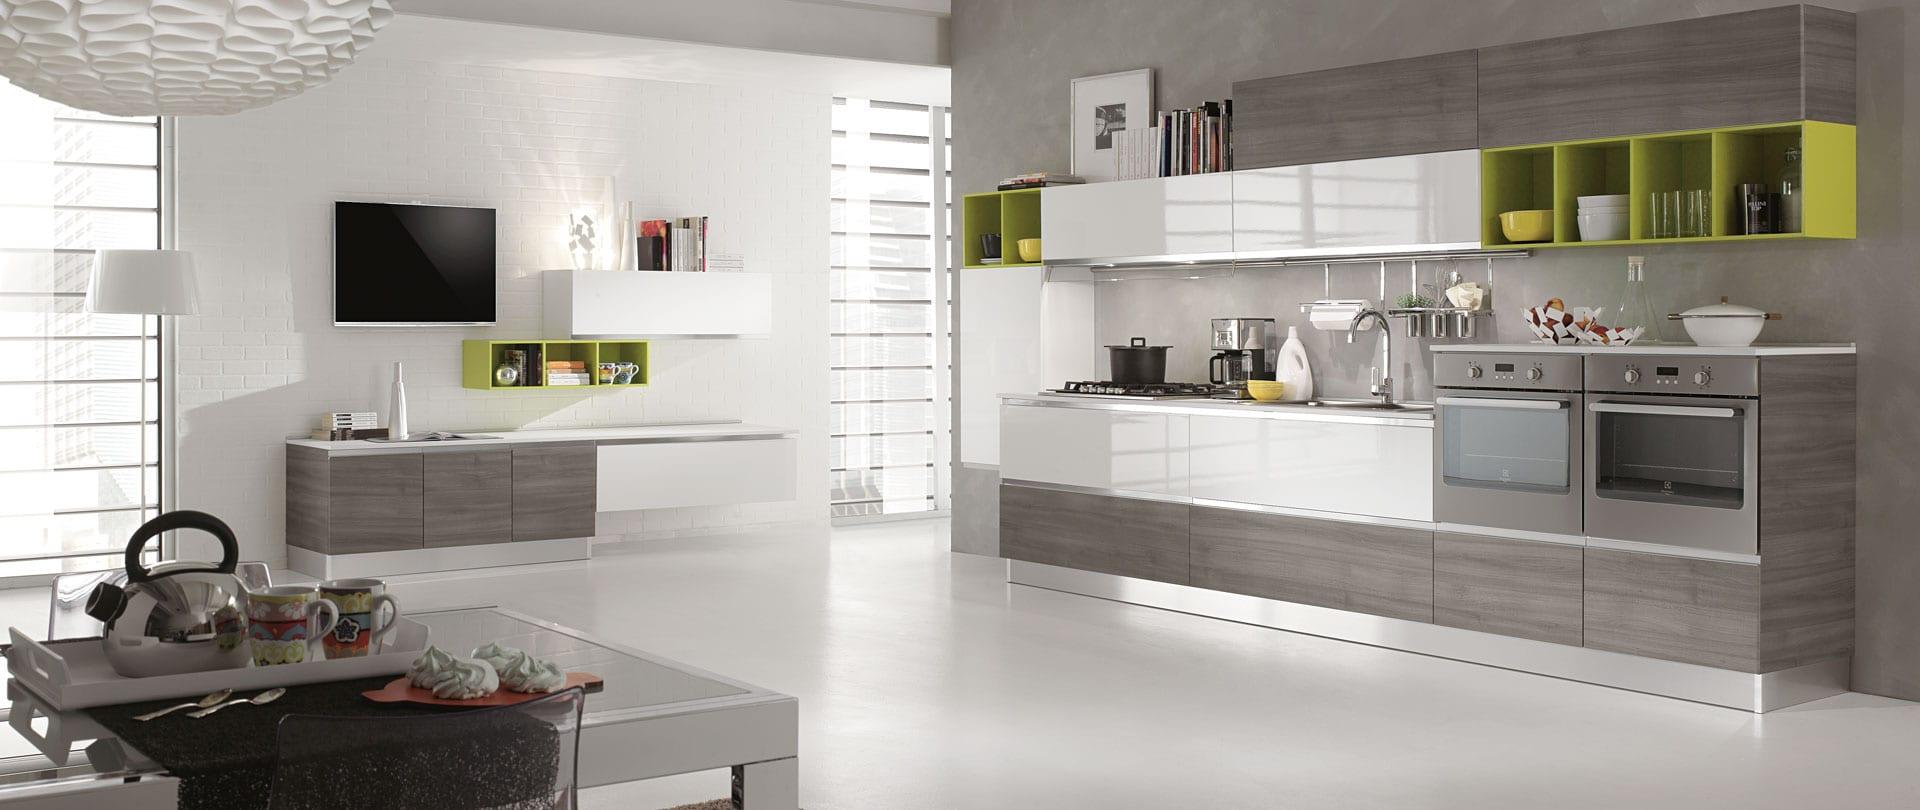 07-cucina-moderna-newmeg-tranche-argilla-bianco-lucido